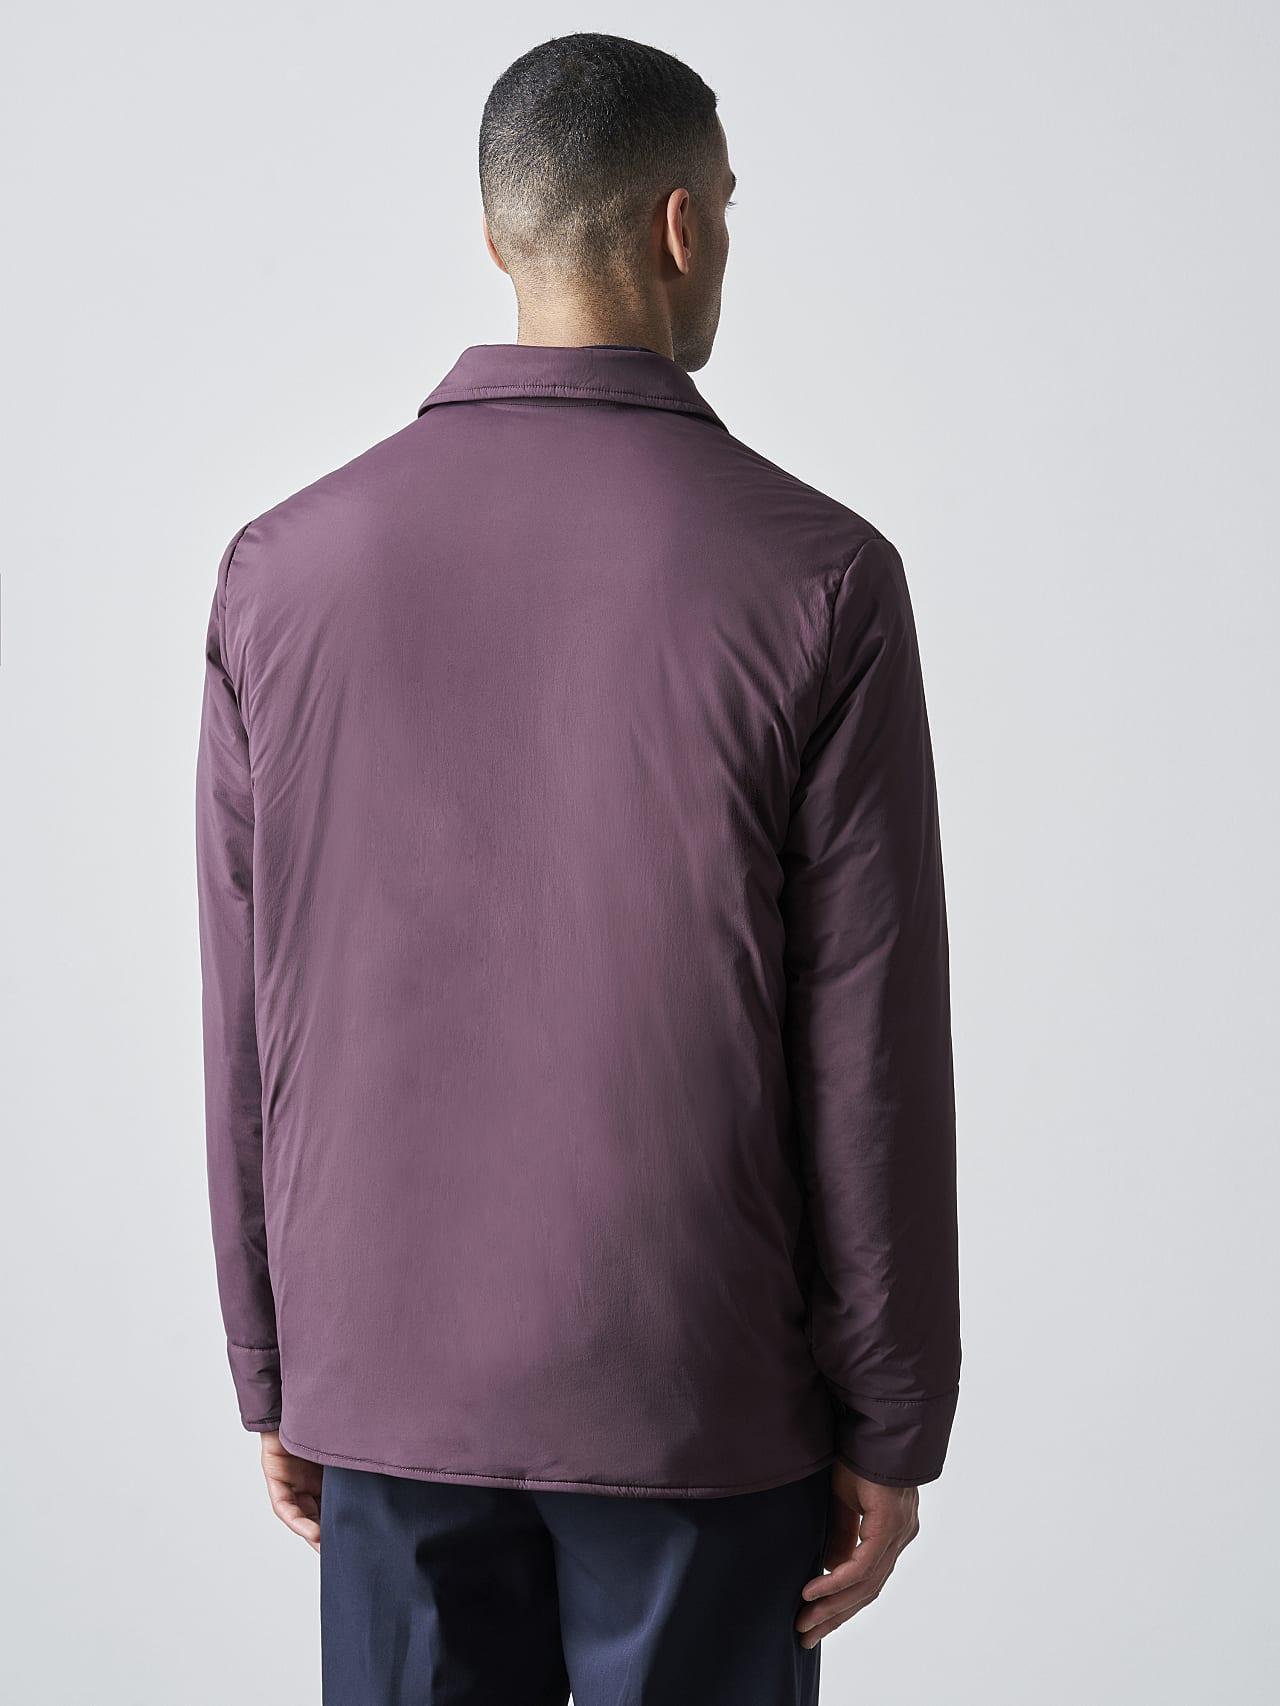 OVASU V1.Y5.02 PrimaLoft® Overshirt Jacket Burgundy Front Main Alpha Tauri